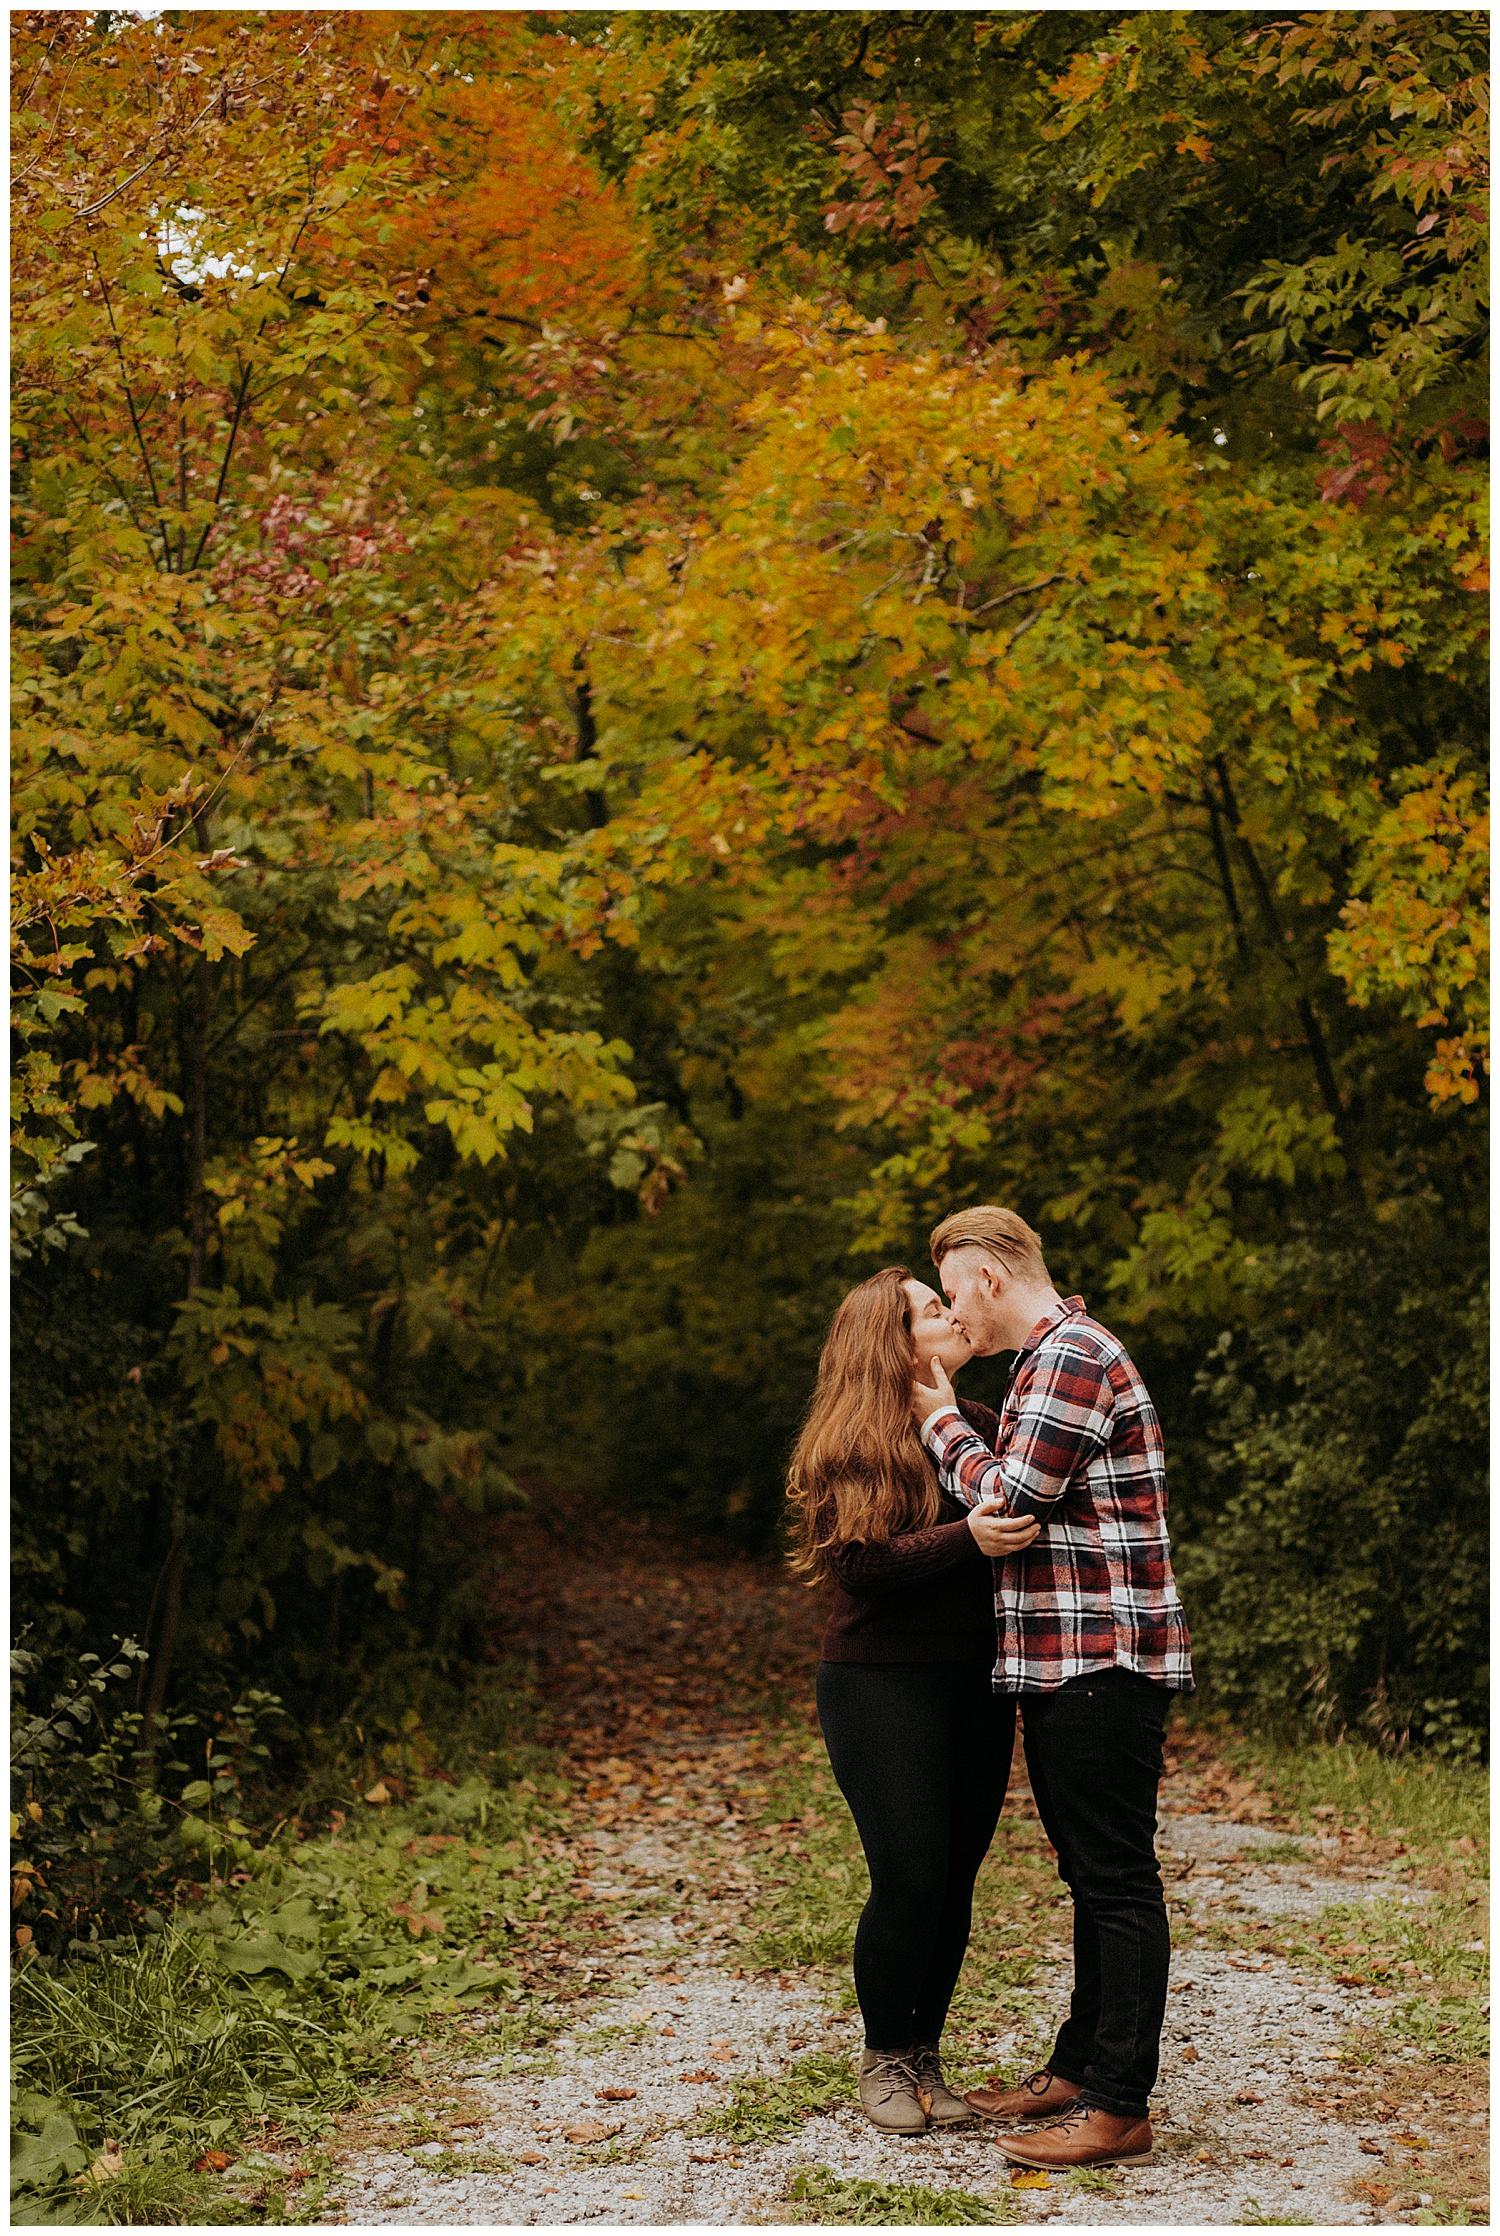 Holly McMurter Photographs | Prince Edward County | Fall Mini Session_0012.jpg